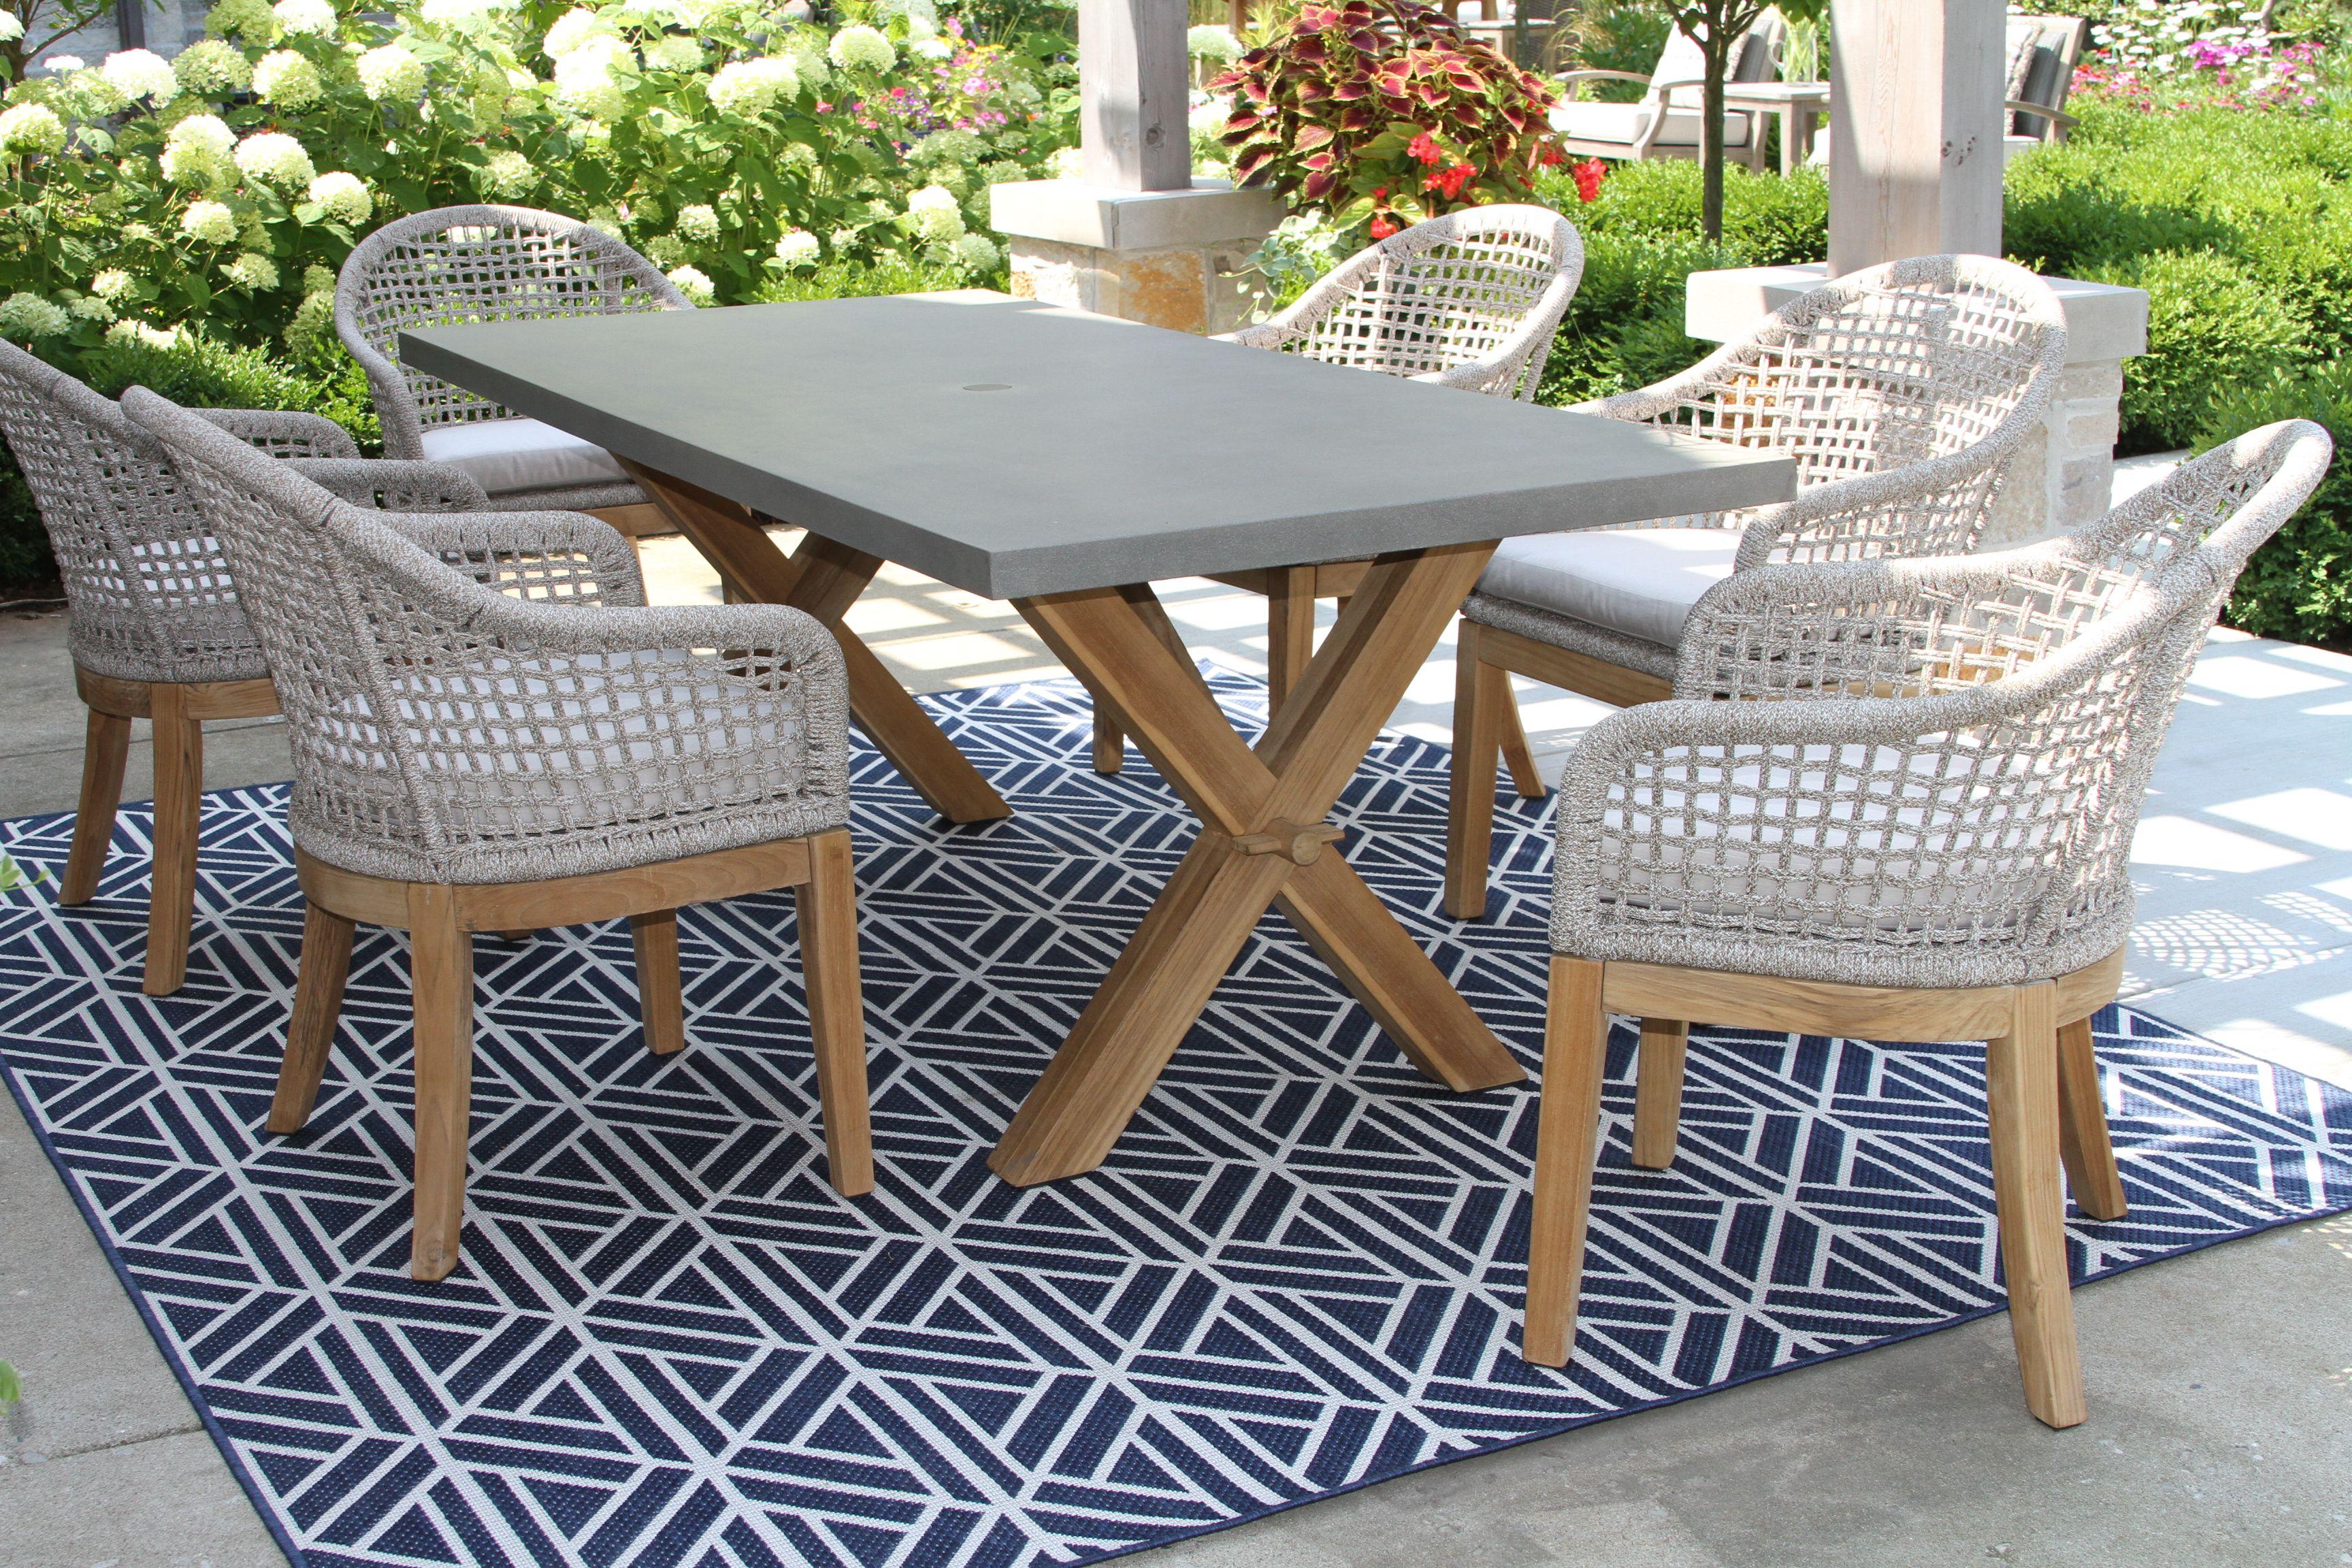 Rope Teak Dining Chair With Sunbrella Cushion 2 Pack And Composite Teak Dining Table Teak Dining Chairs Teak Dining Furniture Outdoor Dining Chairs